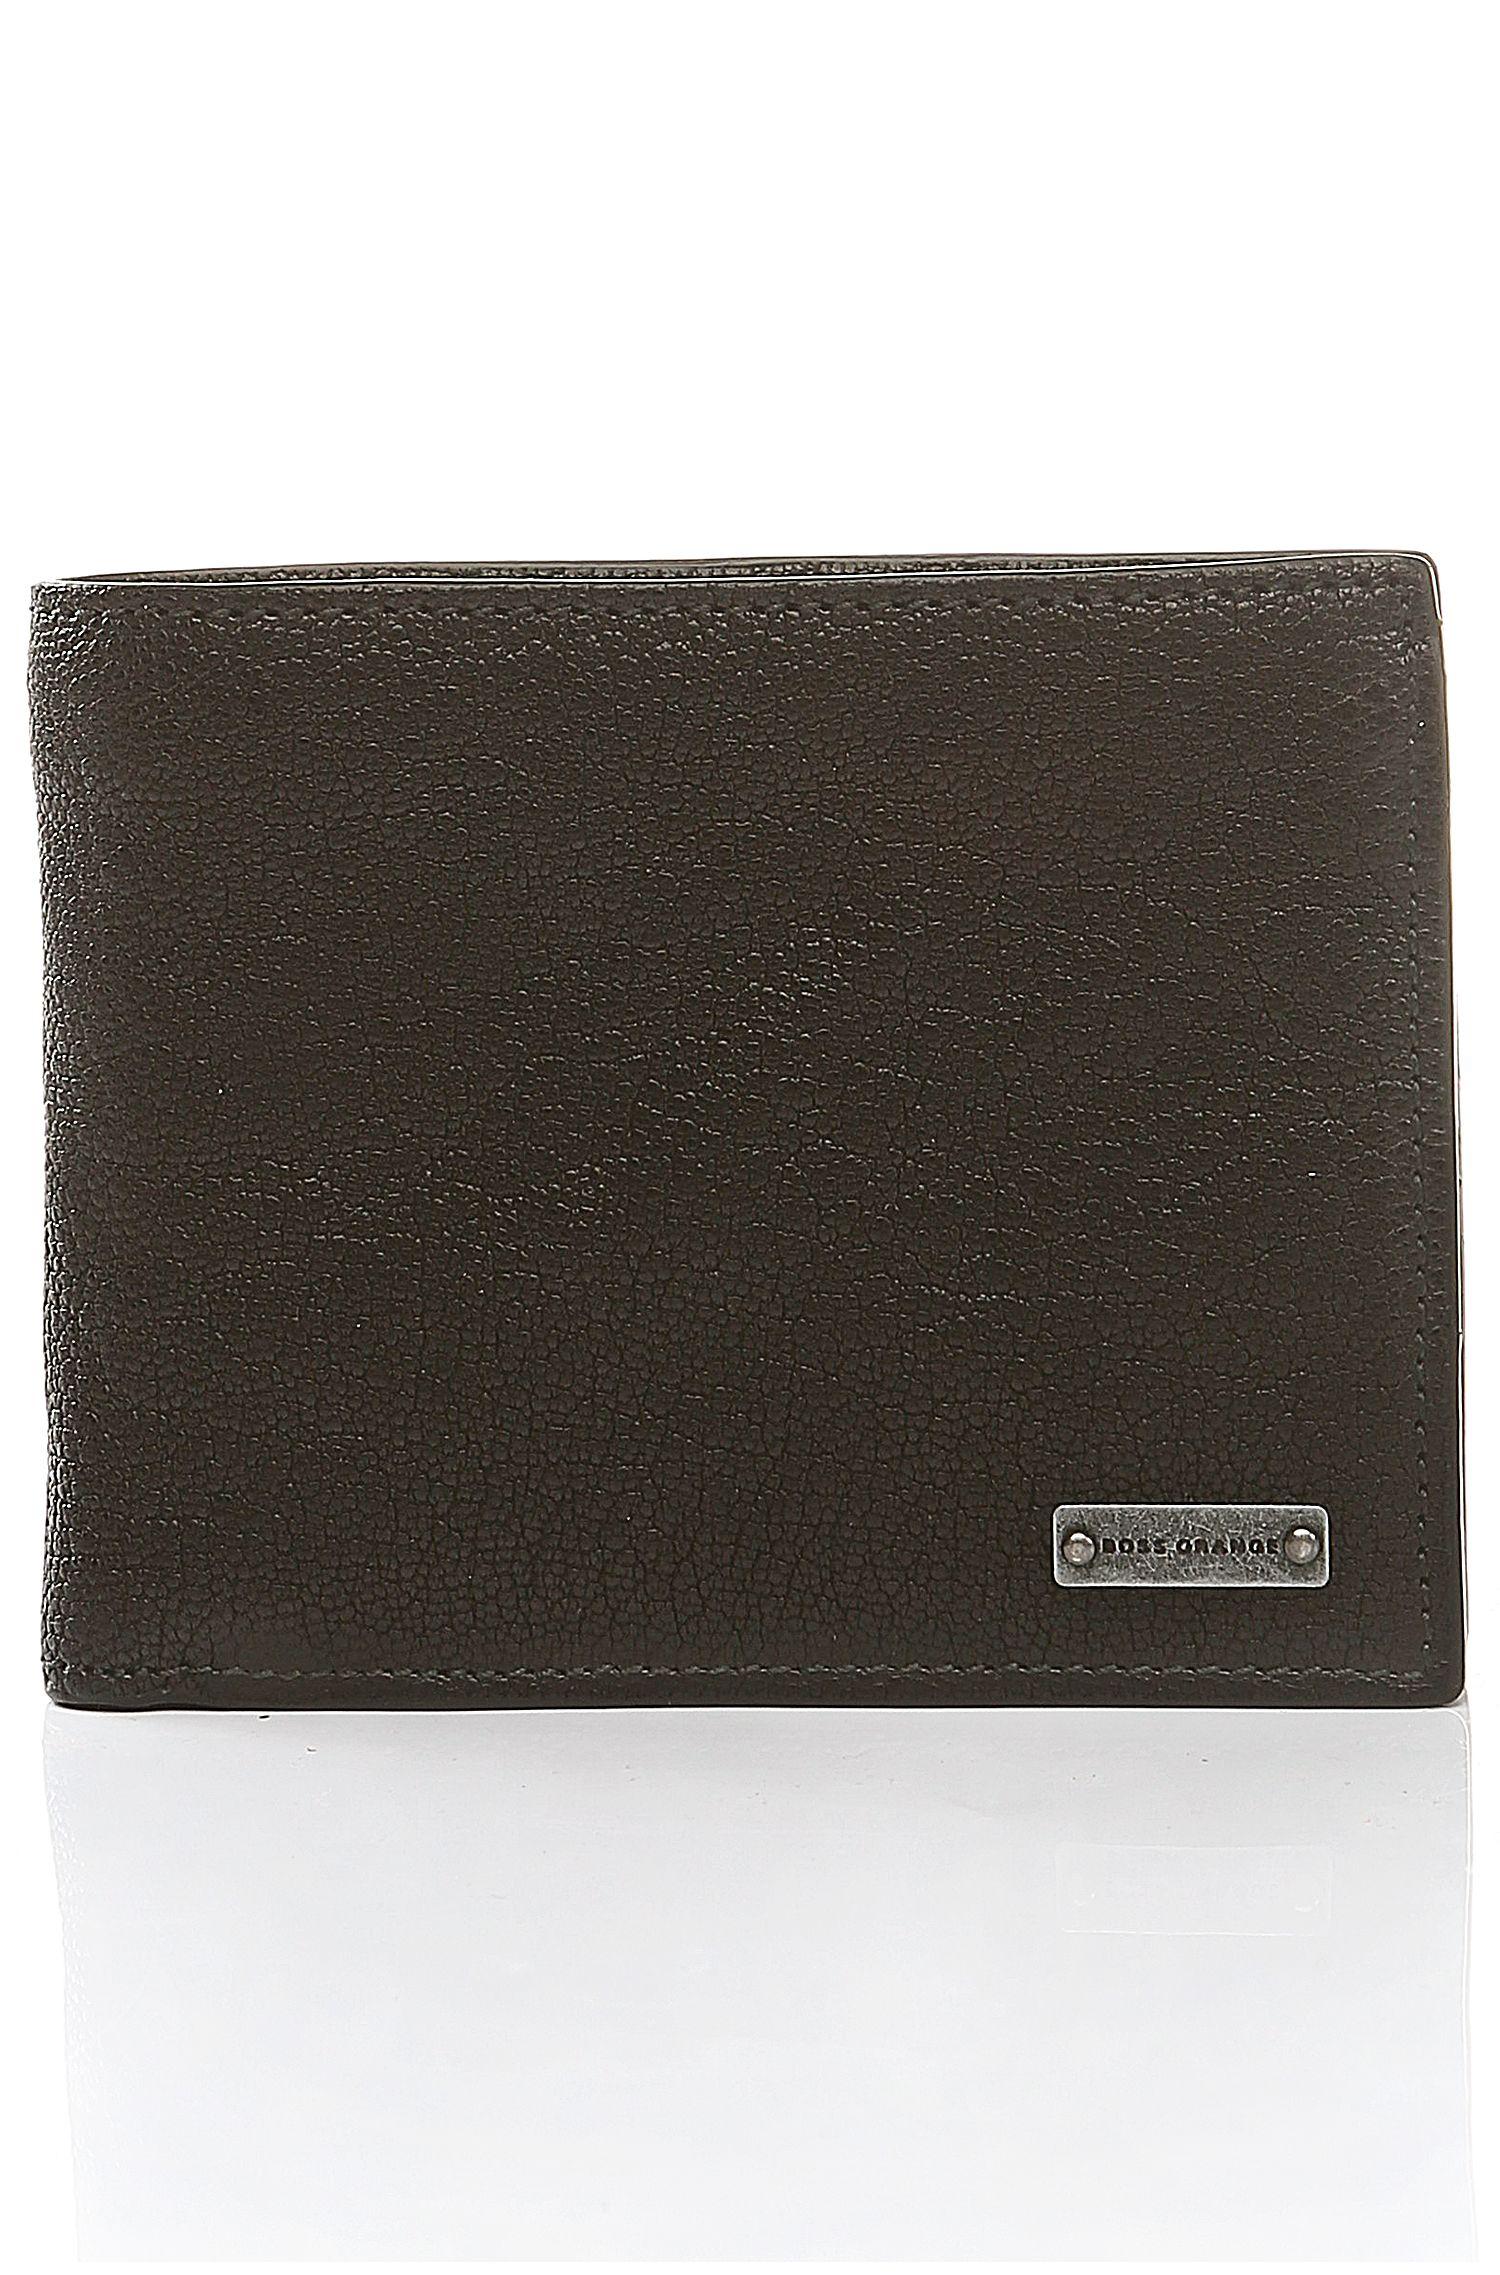 Portemonnaie aus genarbtem Leder: ´Volcano_4 cc coin`